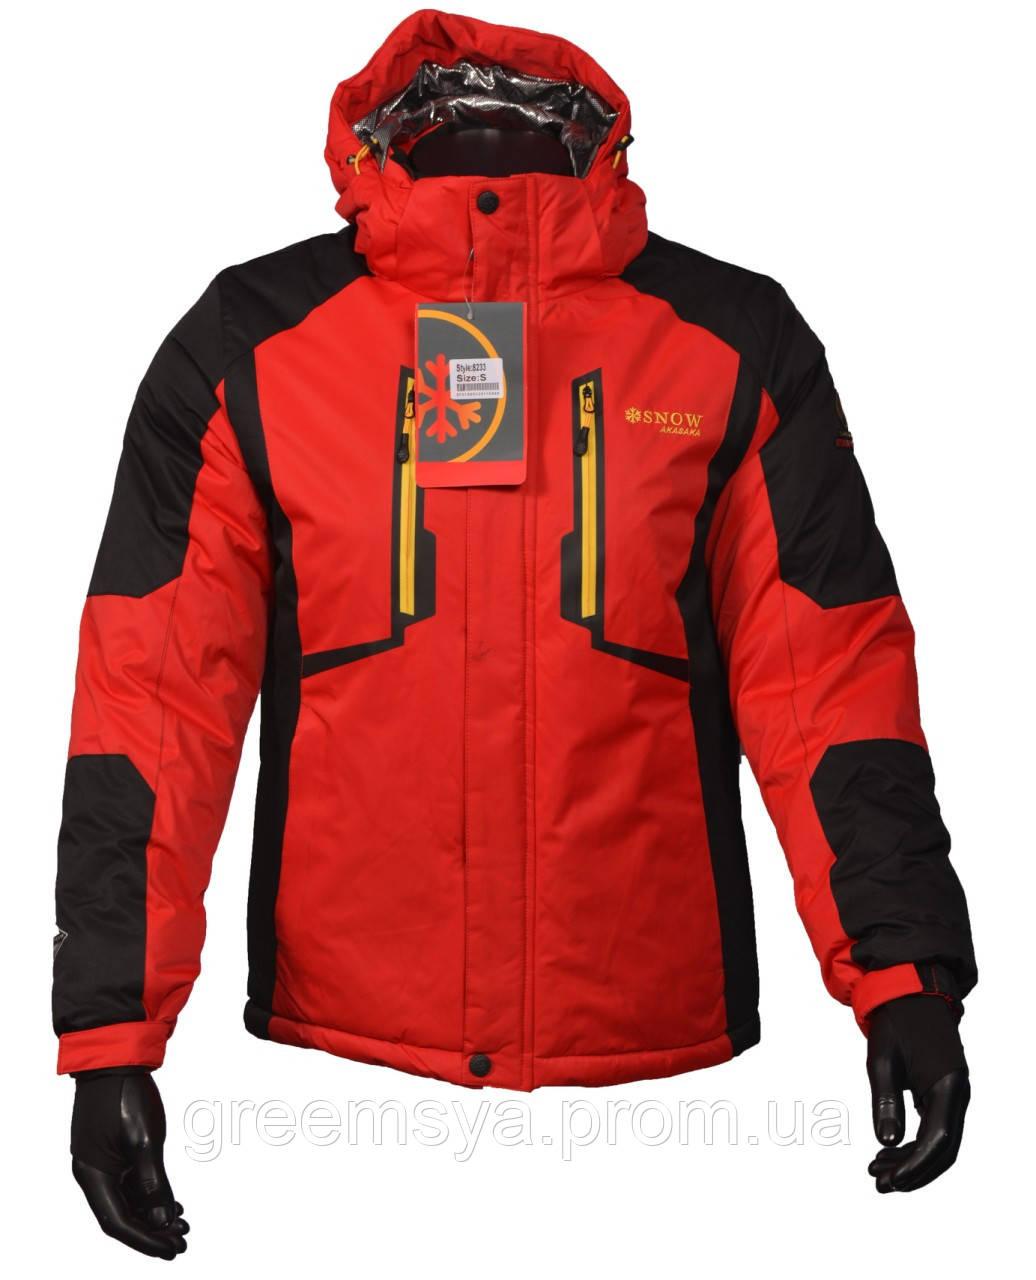 e917c153cb0 Мужская мембранная зимняя куртка.   продажа